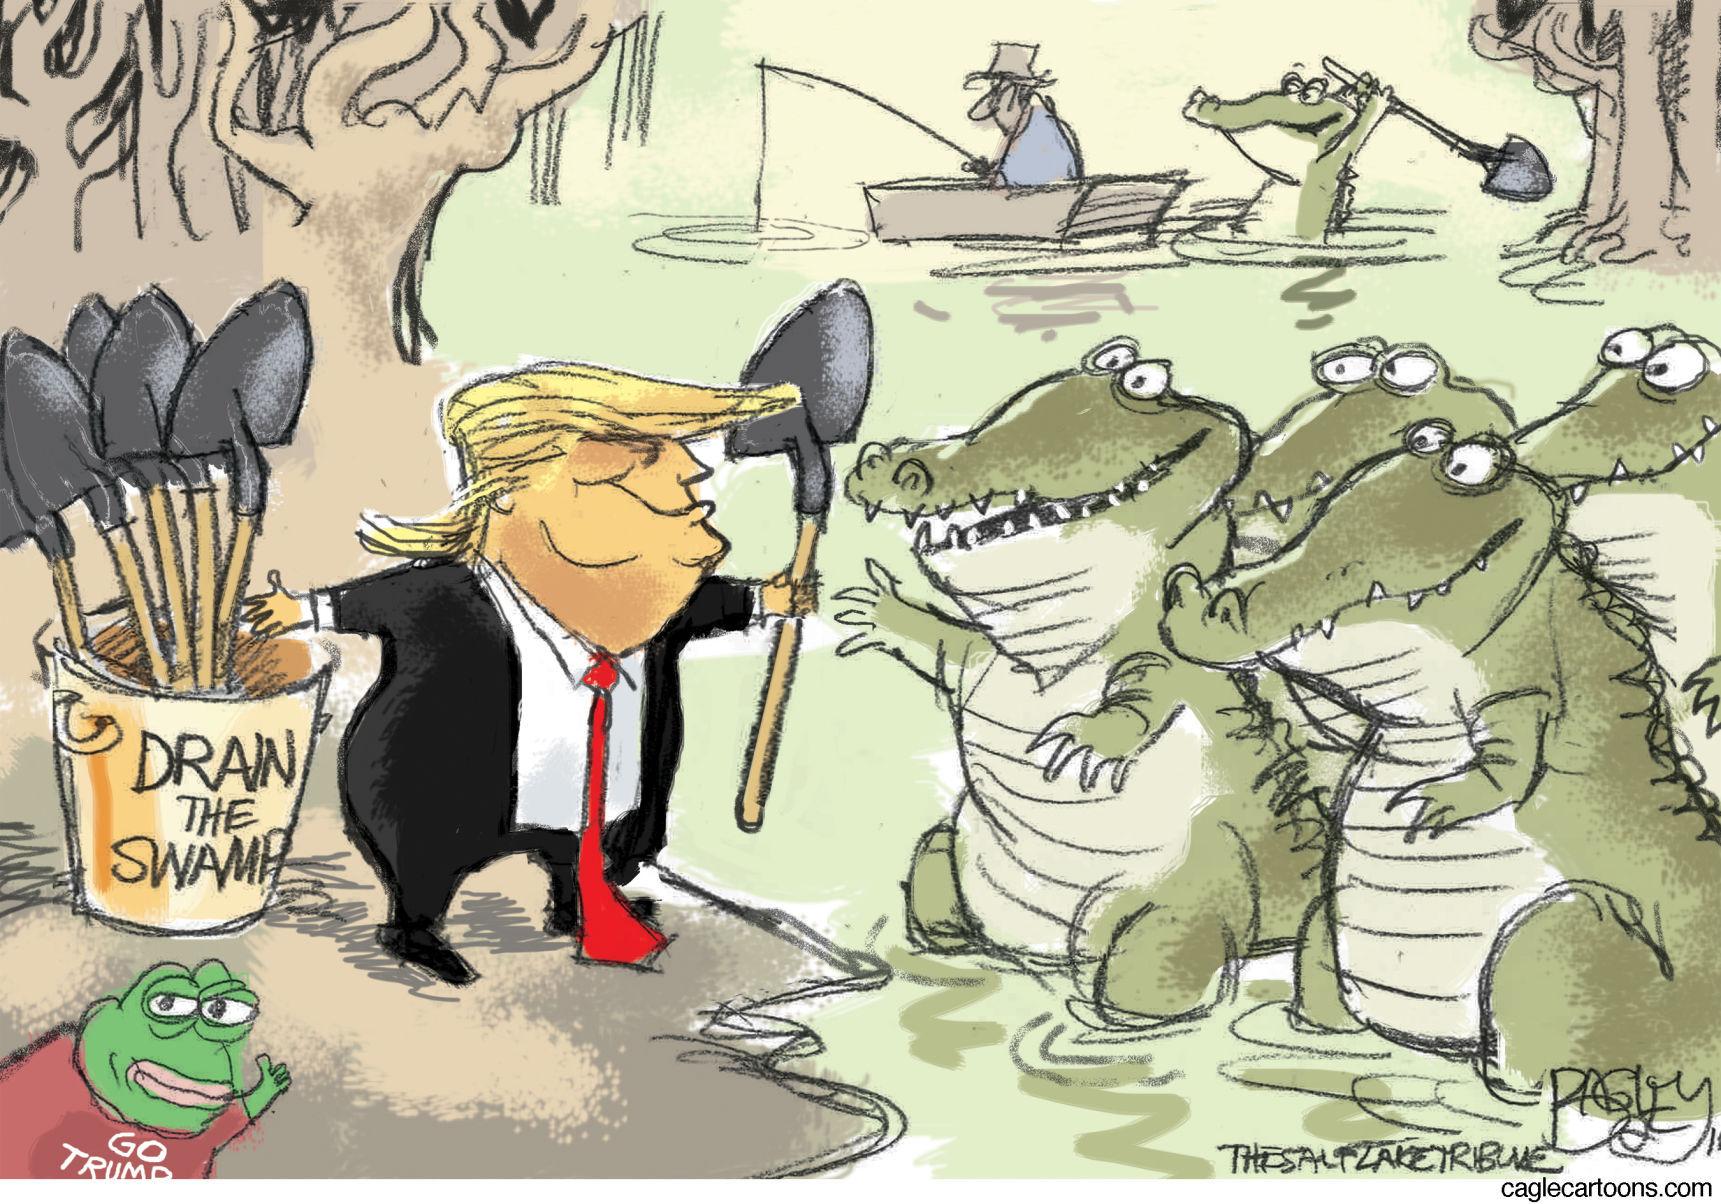 trumpvid Grab Them By The Pussy Donald Trump